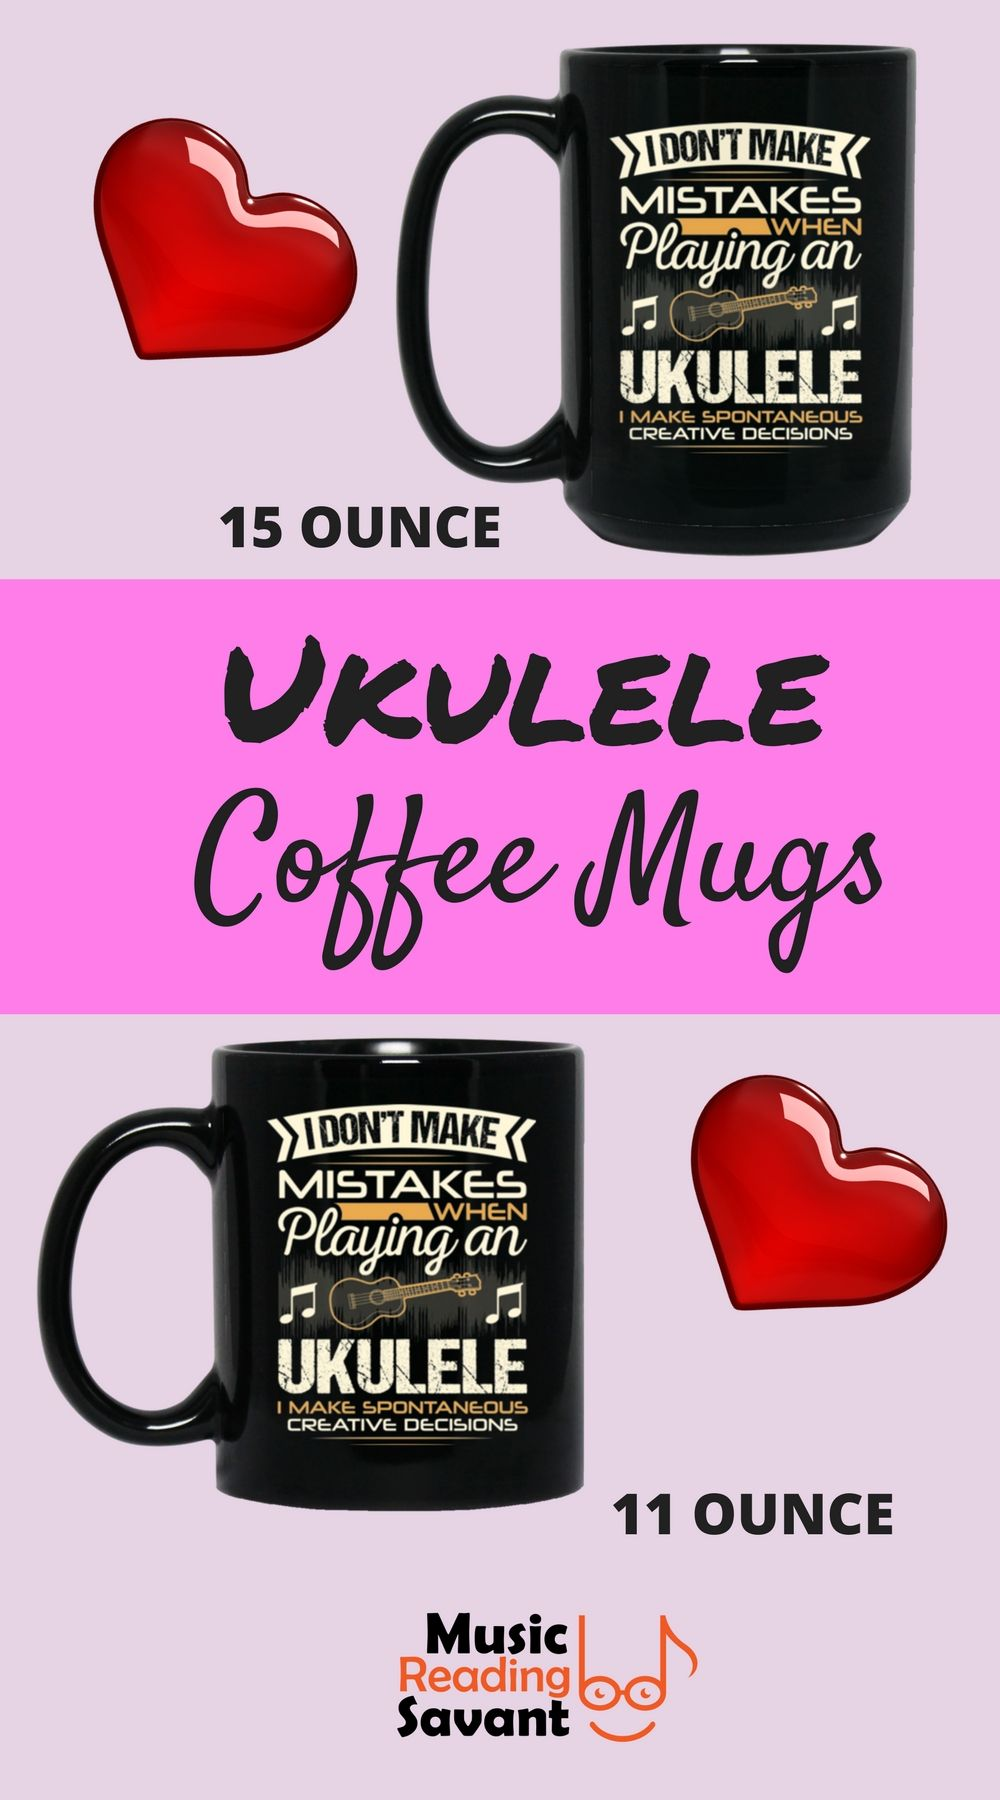 Ukulele coffee mug for ukulele players. Musicians will fall in love with their morning coffee all over again.   Music Reading Savant Store   Music Humor  #ukulele #coffeemug